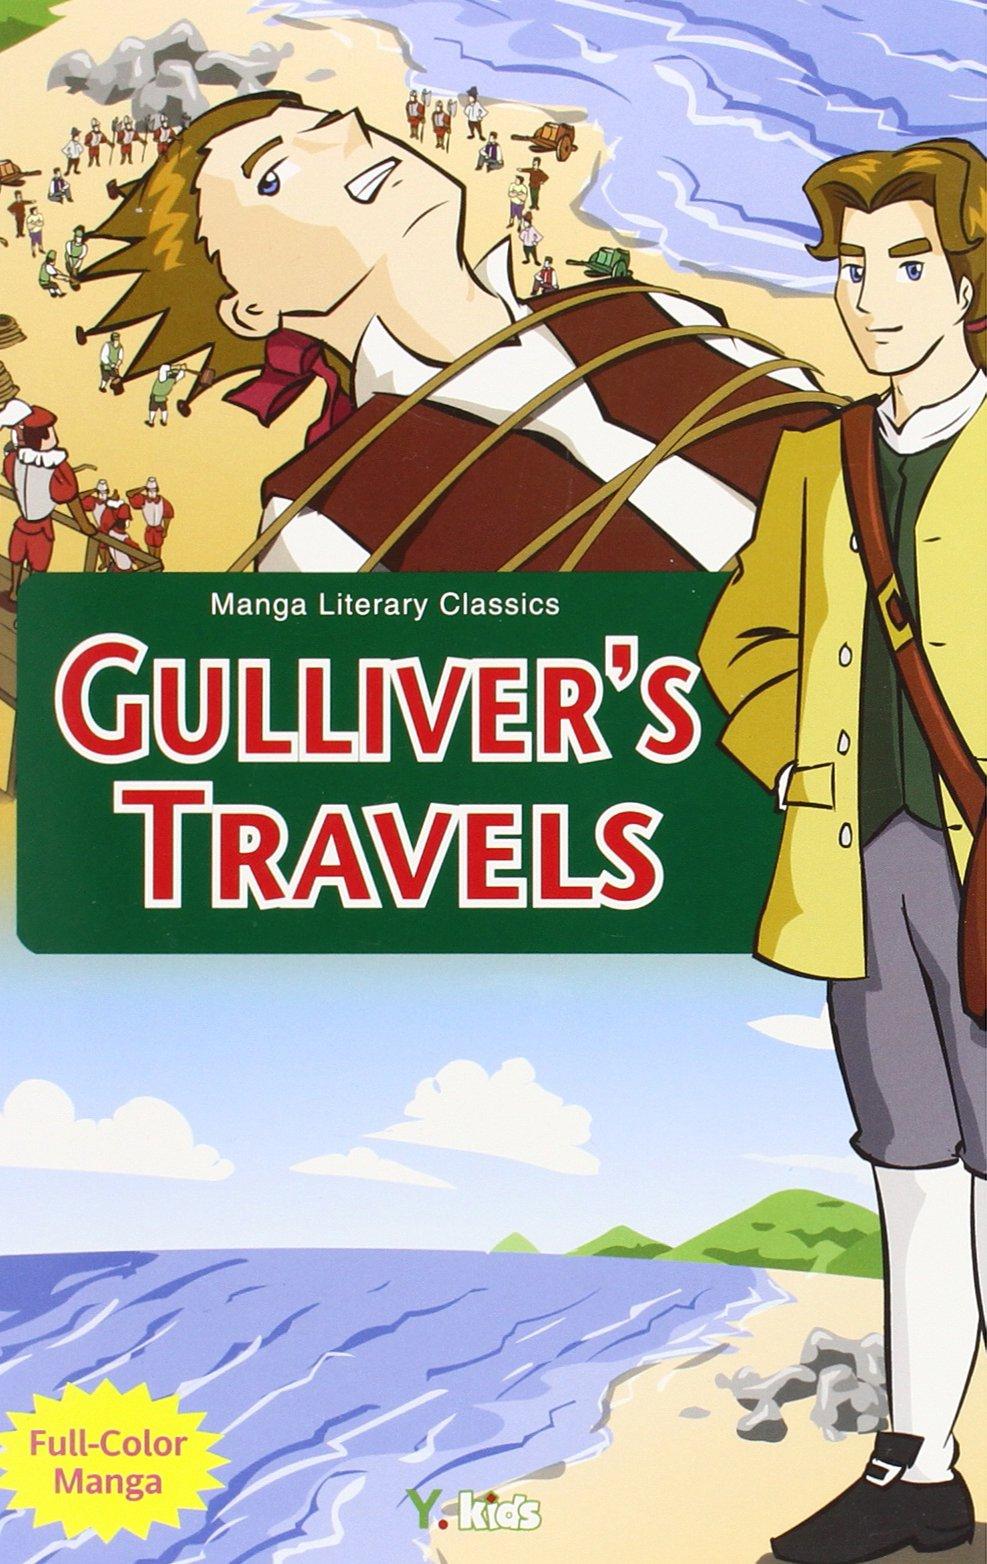 Download Gulliver's Travels (Manga Literary Classics series) ebook